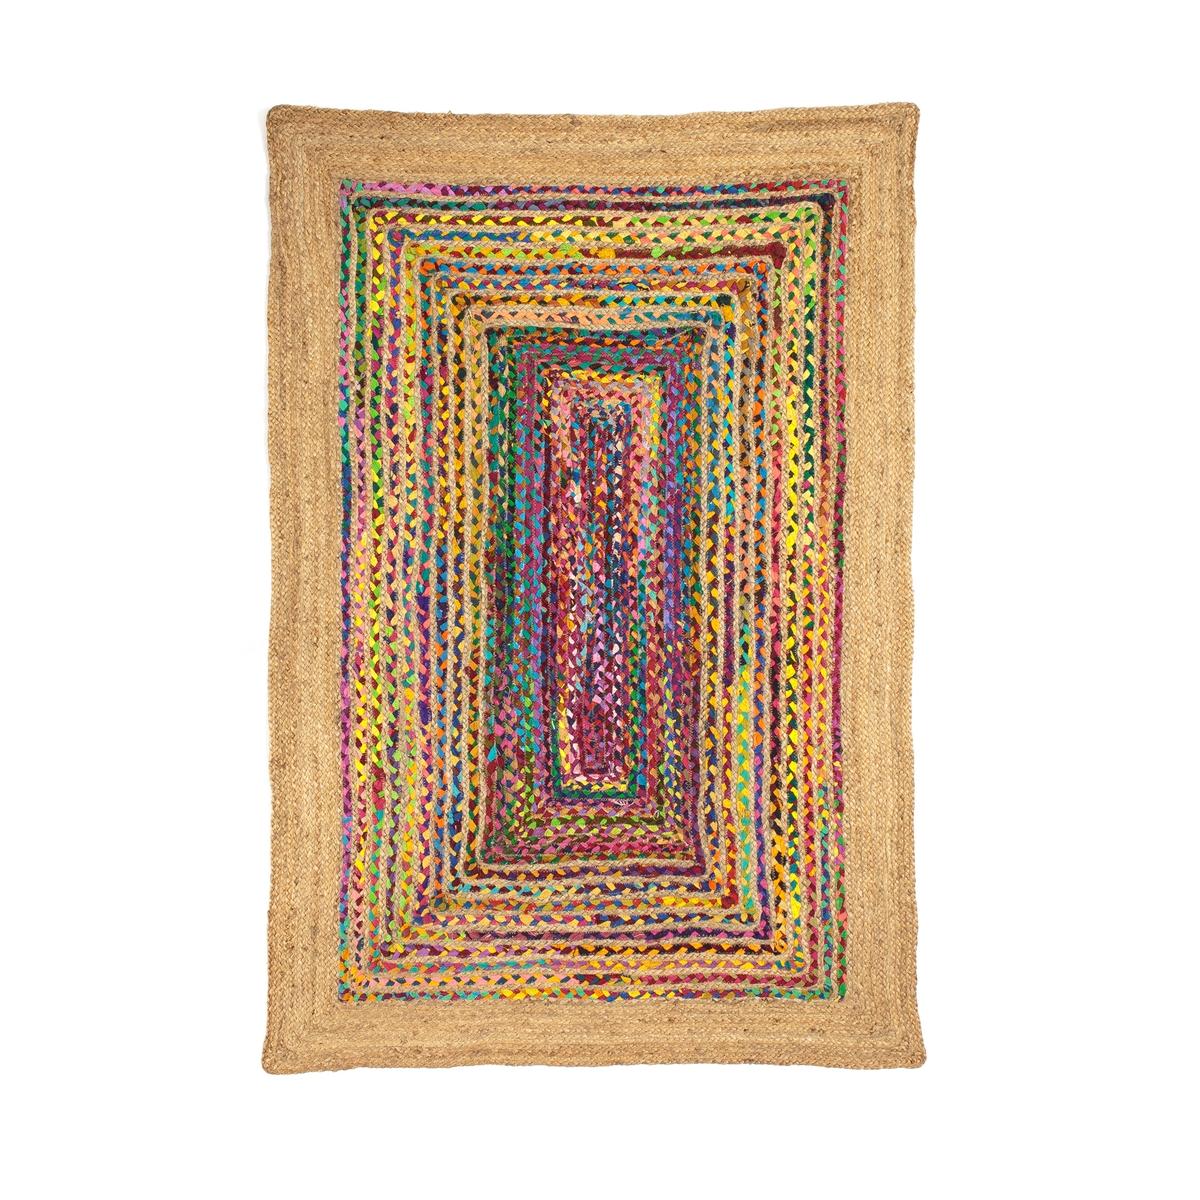 Фото - Ковер LaRedoute Из джута и разноцветного хлопка Jaco 120 x 180 см разноцветный ковер laredoute из джута и хлопка пастельных тонов bazyli 120 x 180 см разноцветный